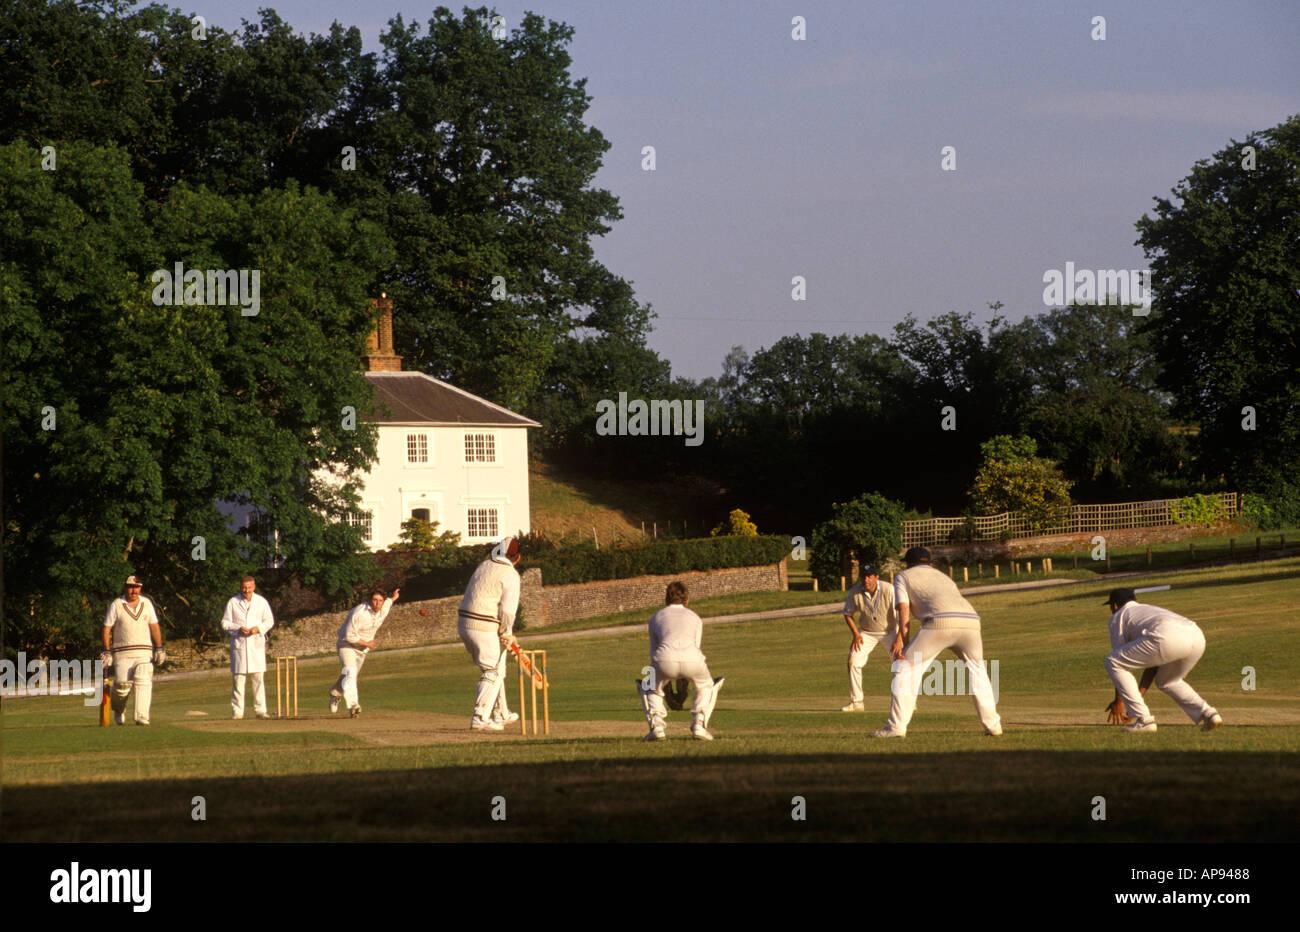 Village cricket game at Tilford Surrey. England HOMER SYKES Stock Photo